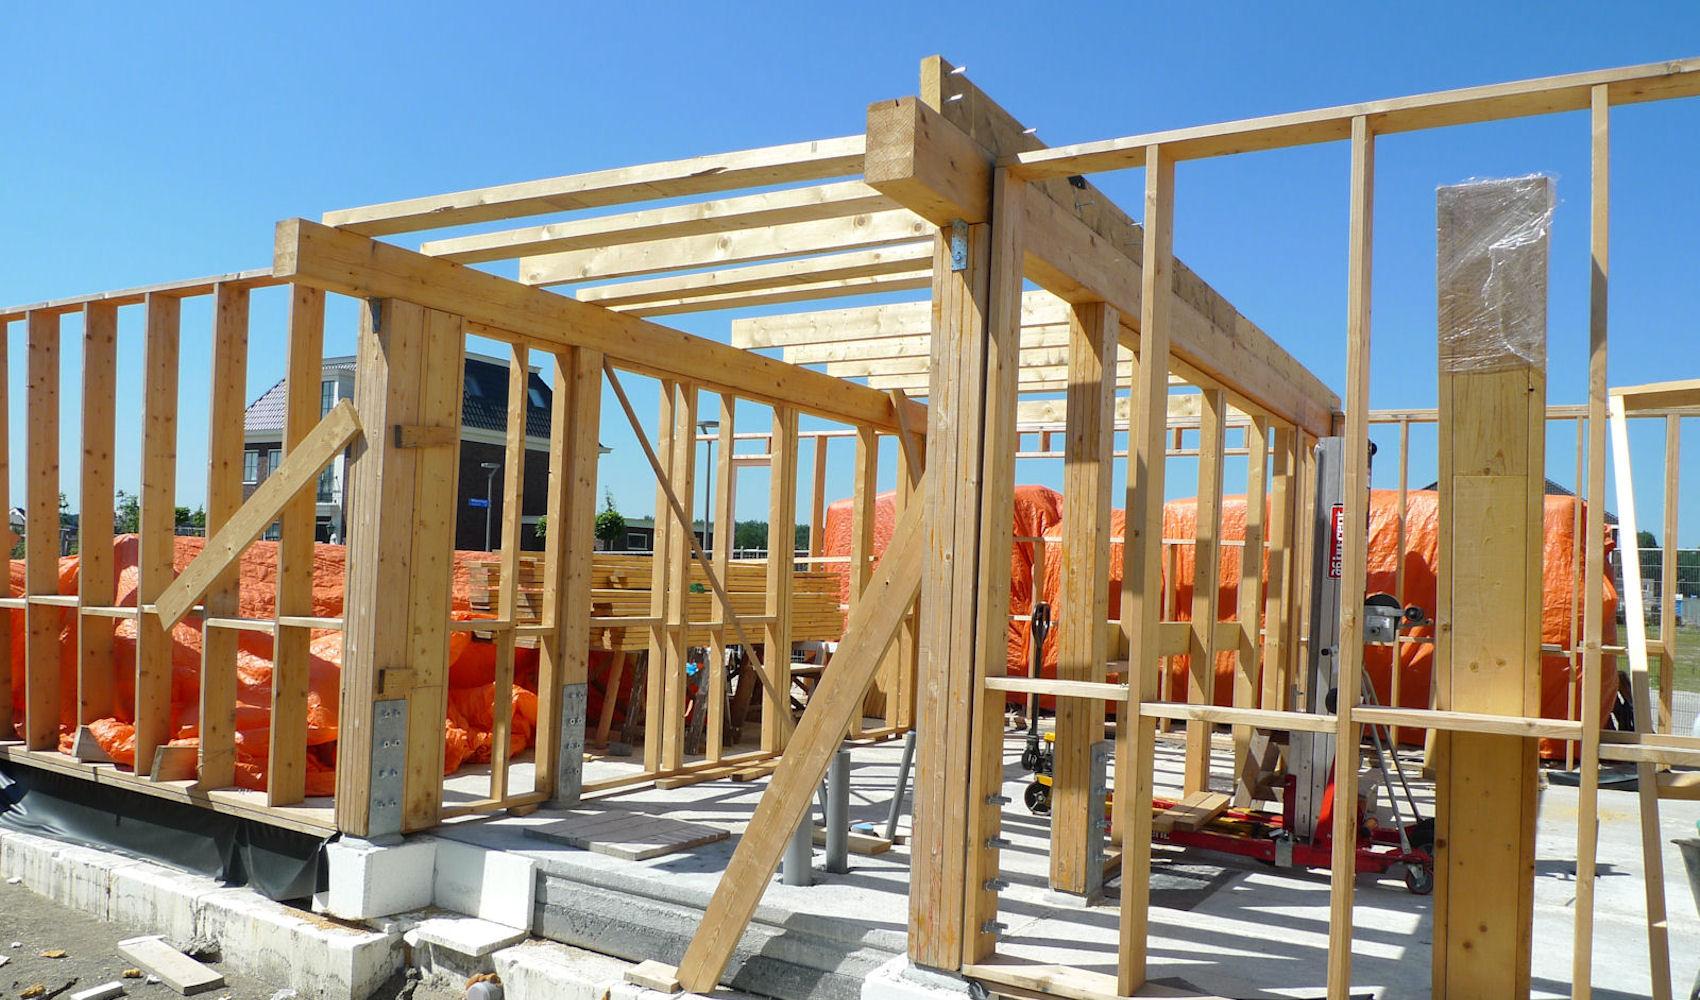 Ontwerp a studio ir hajo schilperoort architect - Huis architect hout ...